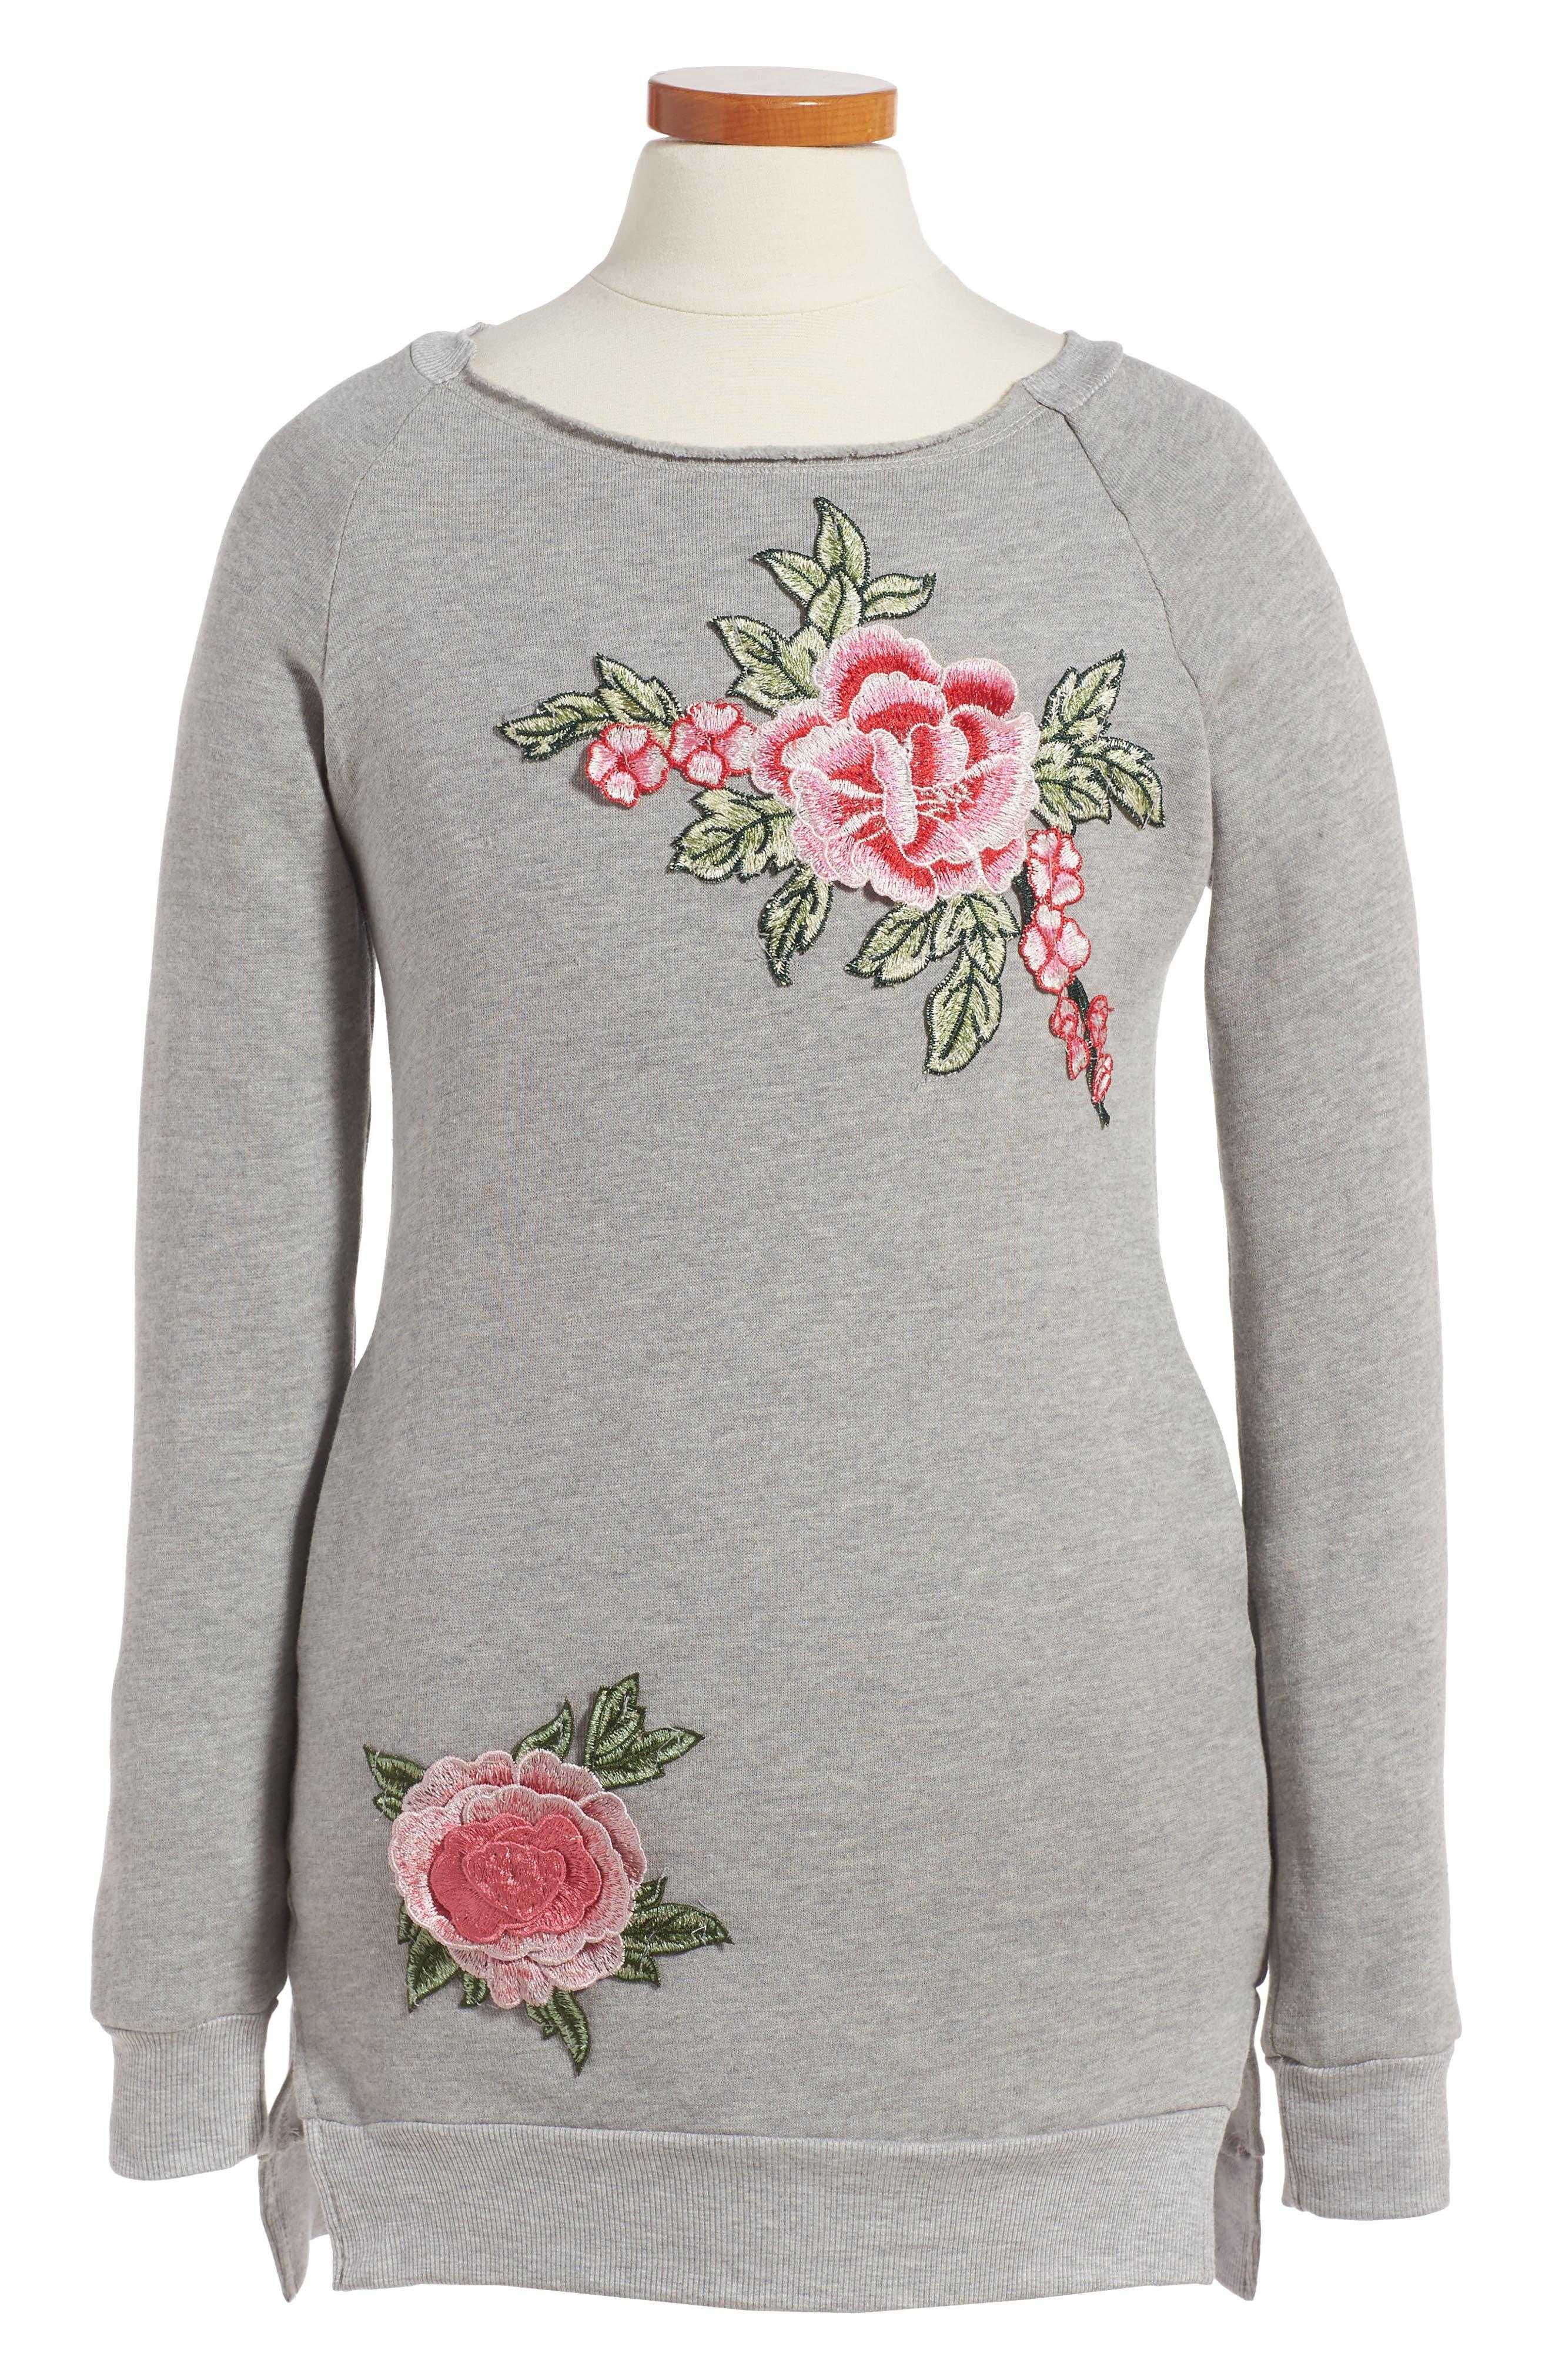 PPLA Dreamer Appliqué Sweatshirt Dress (Big Girls)